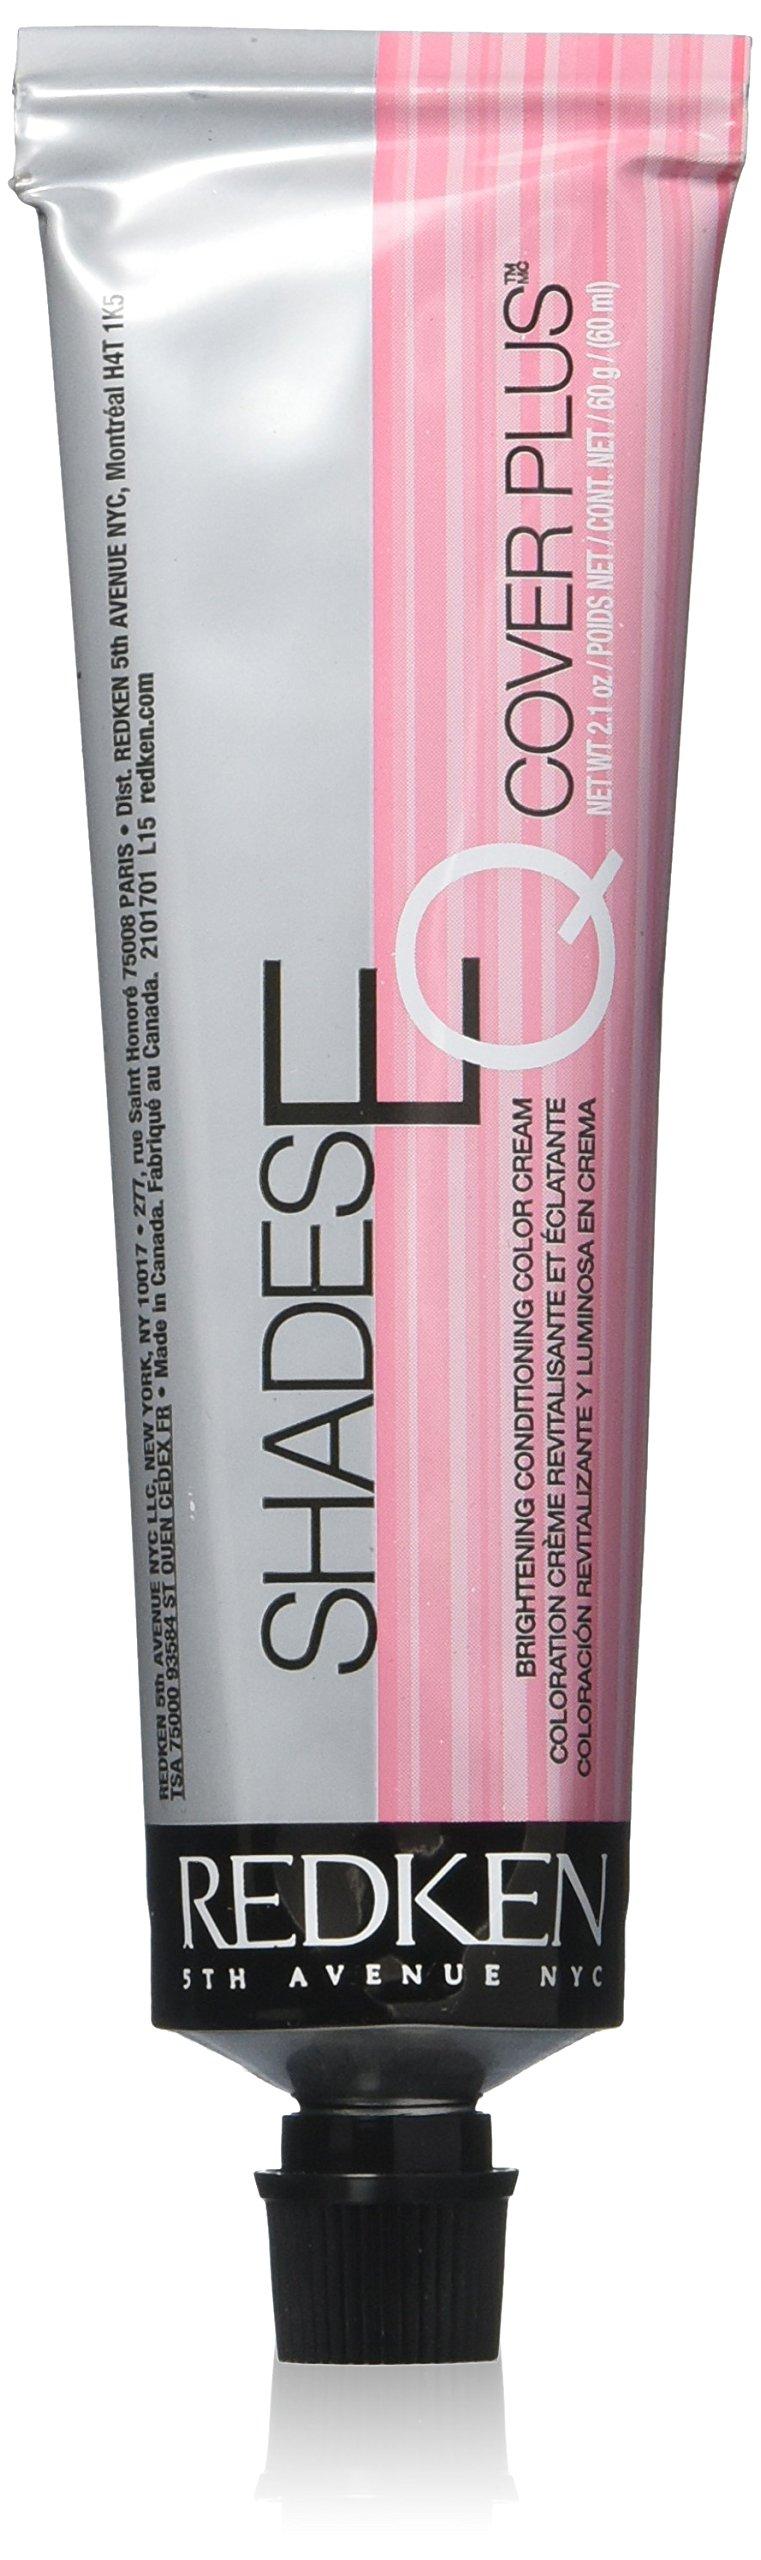 Amazon Redken Shades Eq Cover Plus Cream Hair Color For Unisex